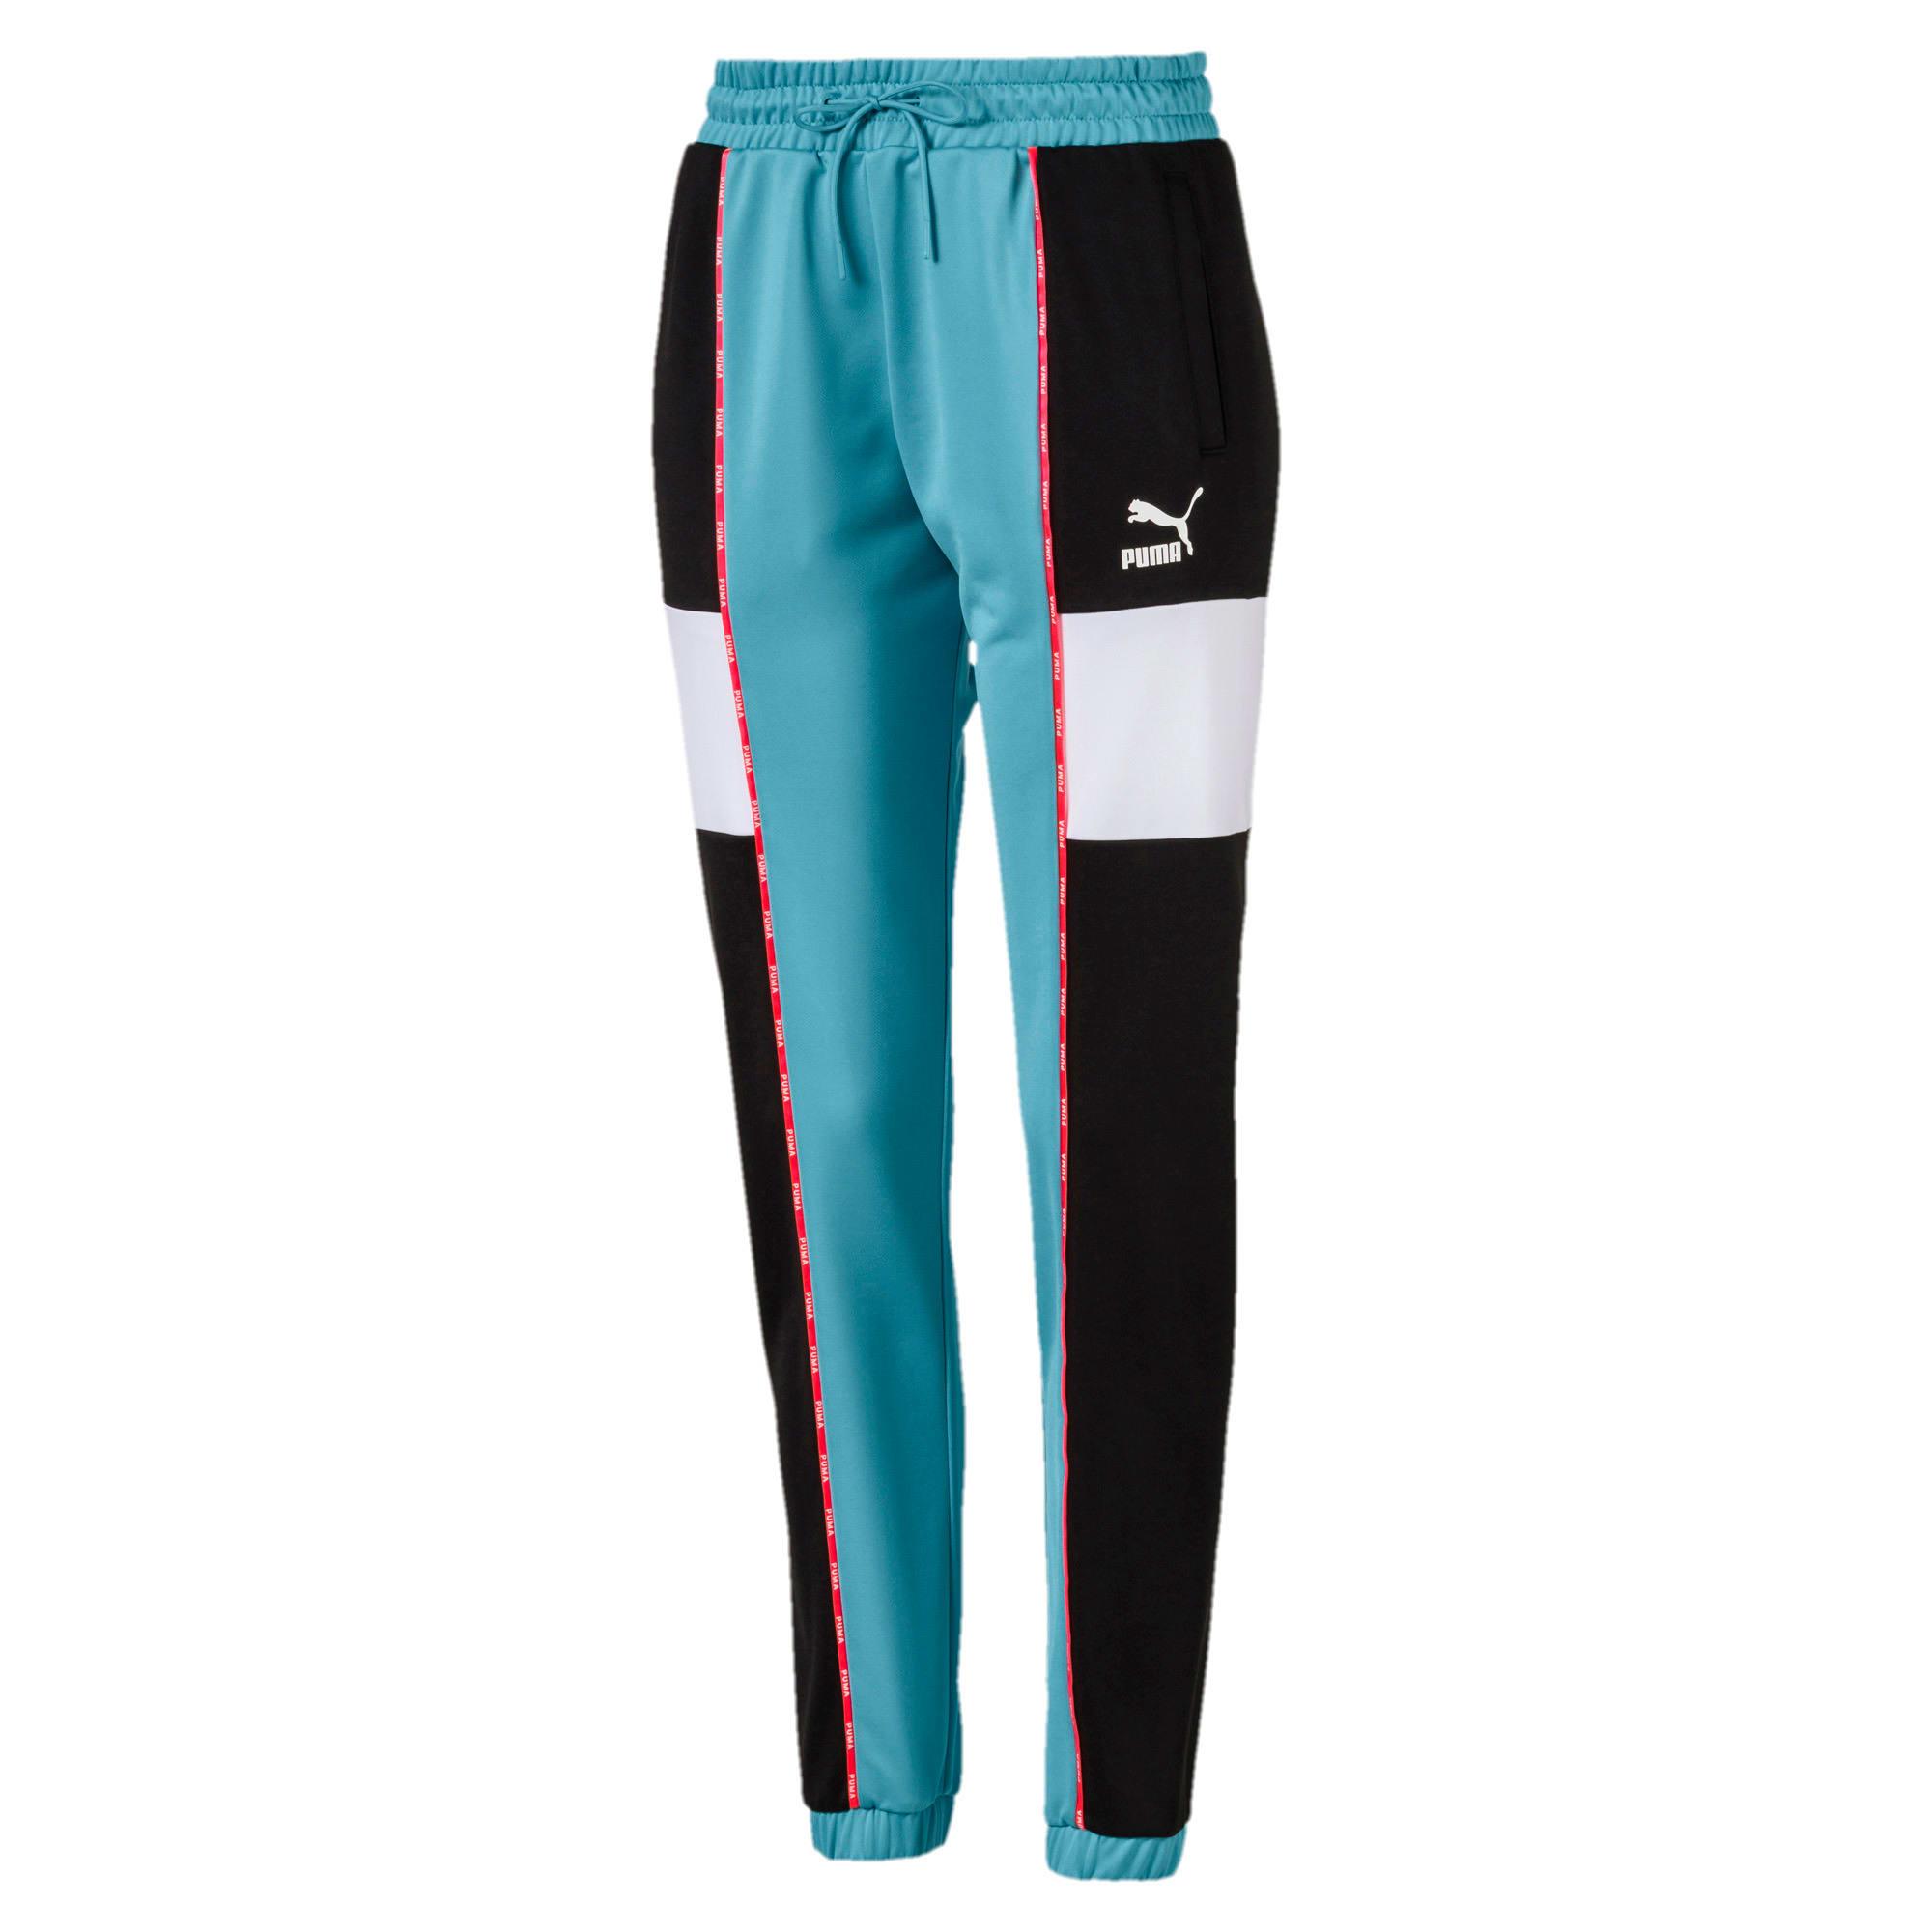 Miniatura 4 de Pantalones deportivos PUMA XTG para mujer, Milky Blue, mediano